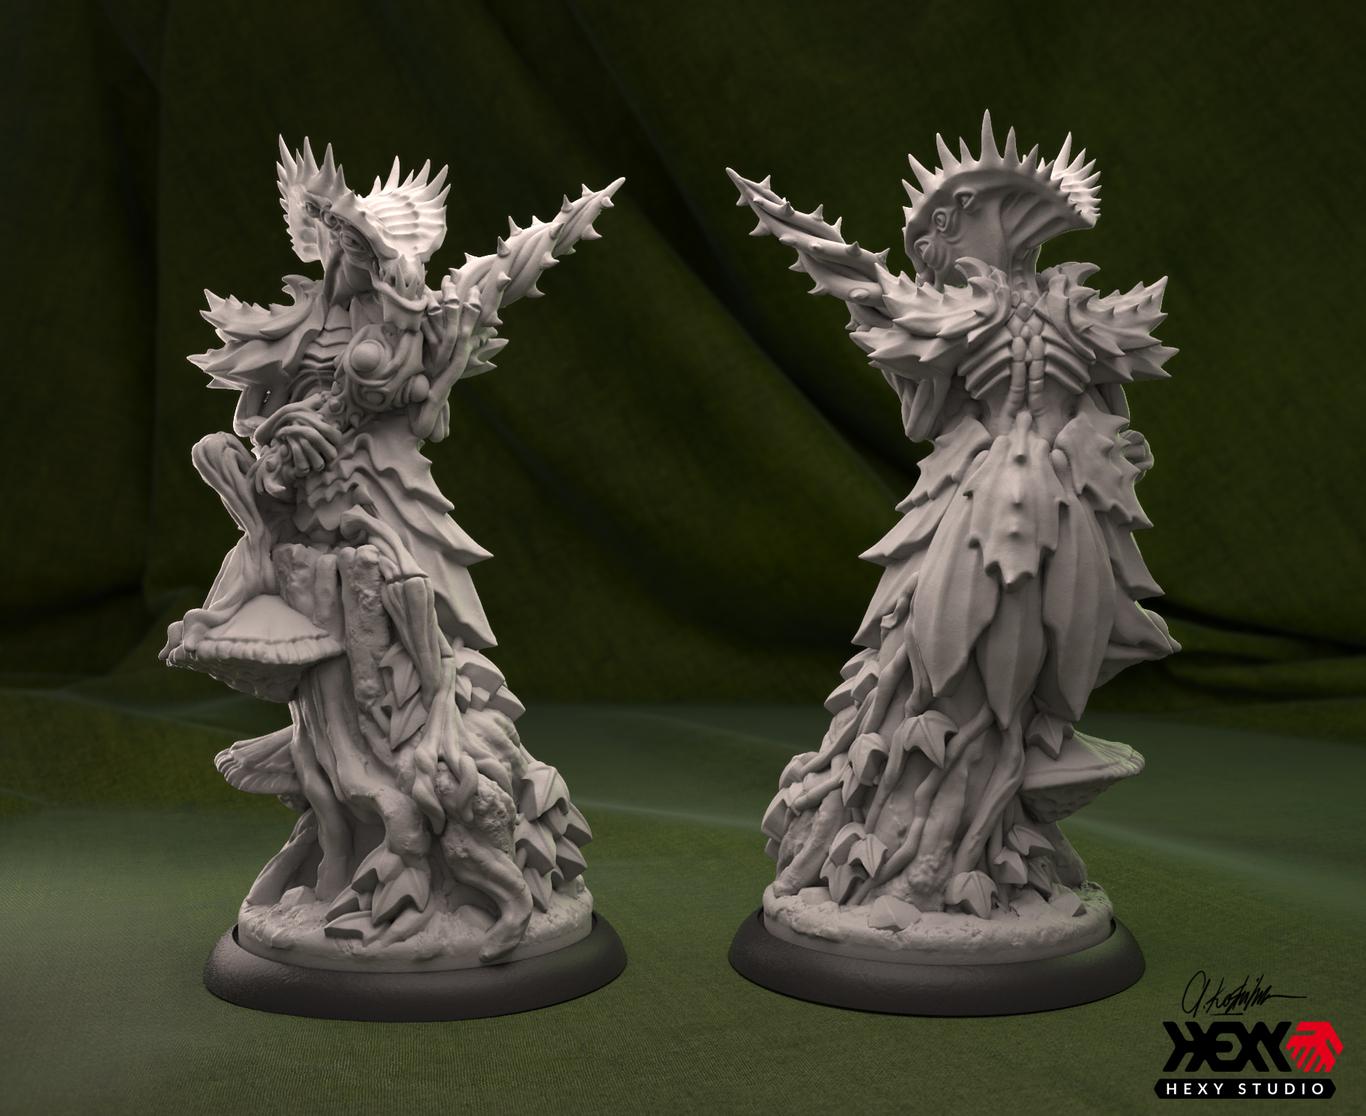 Grzegorzkorniluk weedlock alien sculp 1 c3b8e518 gh4m